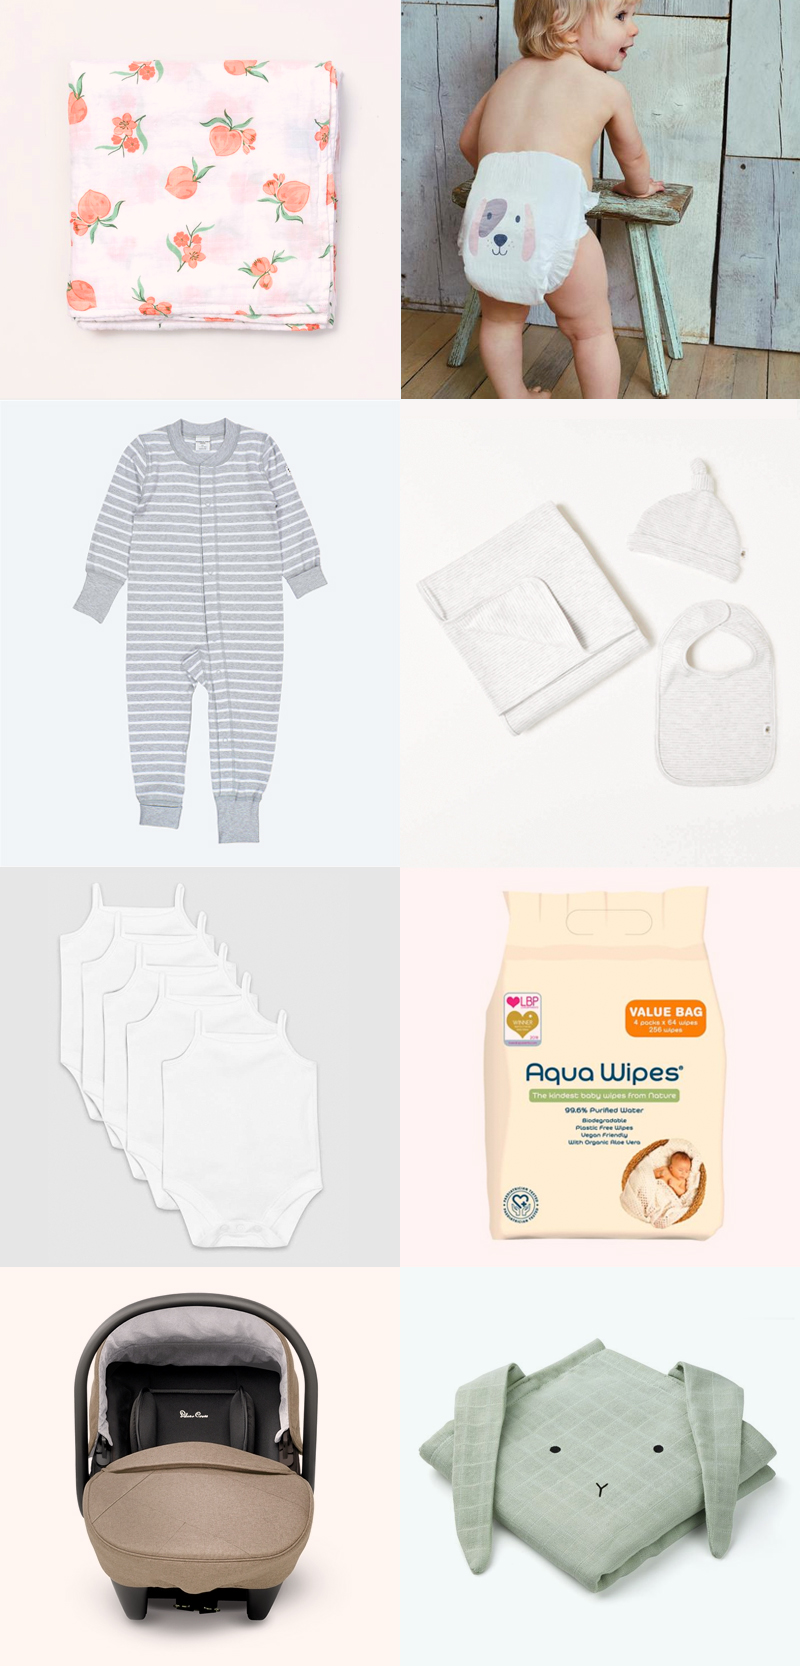 calm-natural-birth-hospital-bag-list-essentials-for-baby-nancy-straughan-blog.jpg